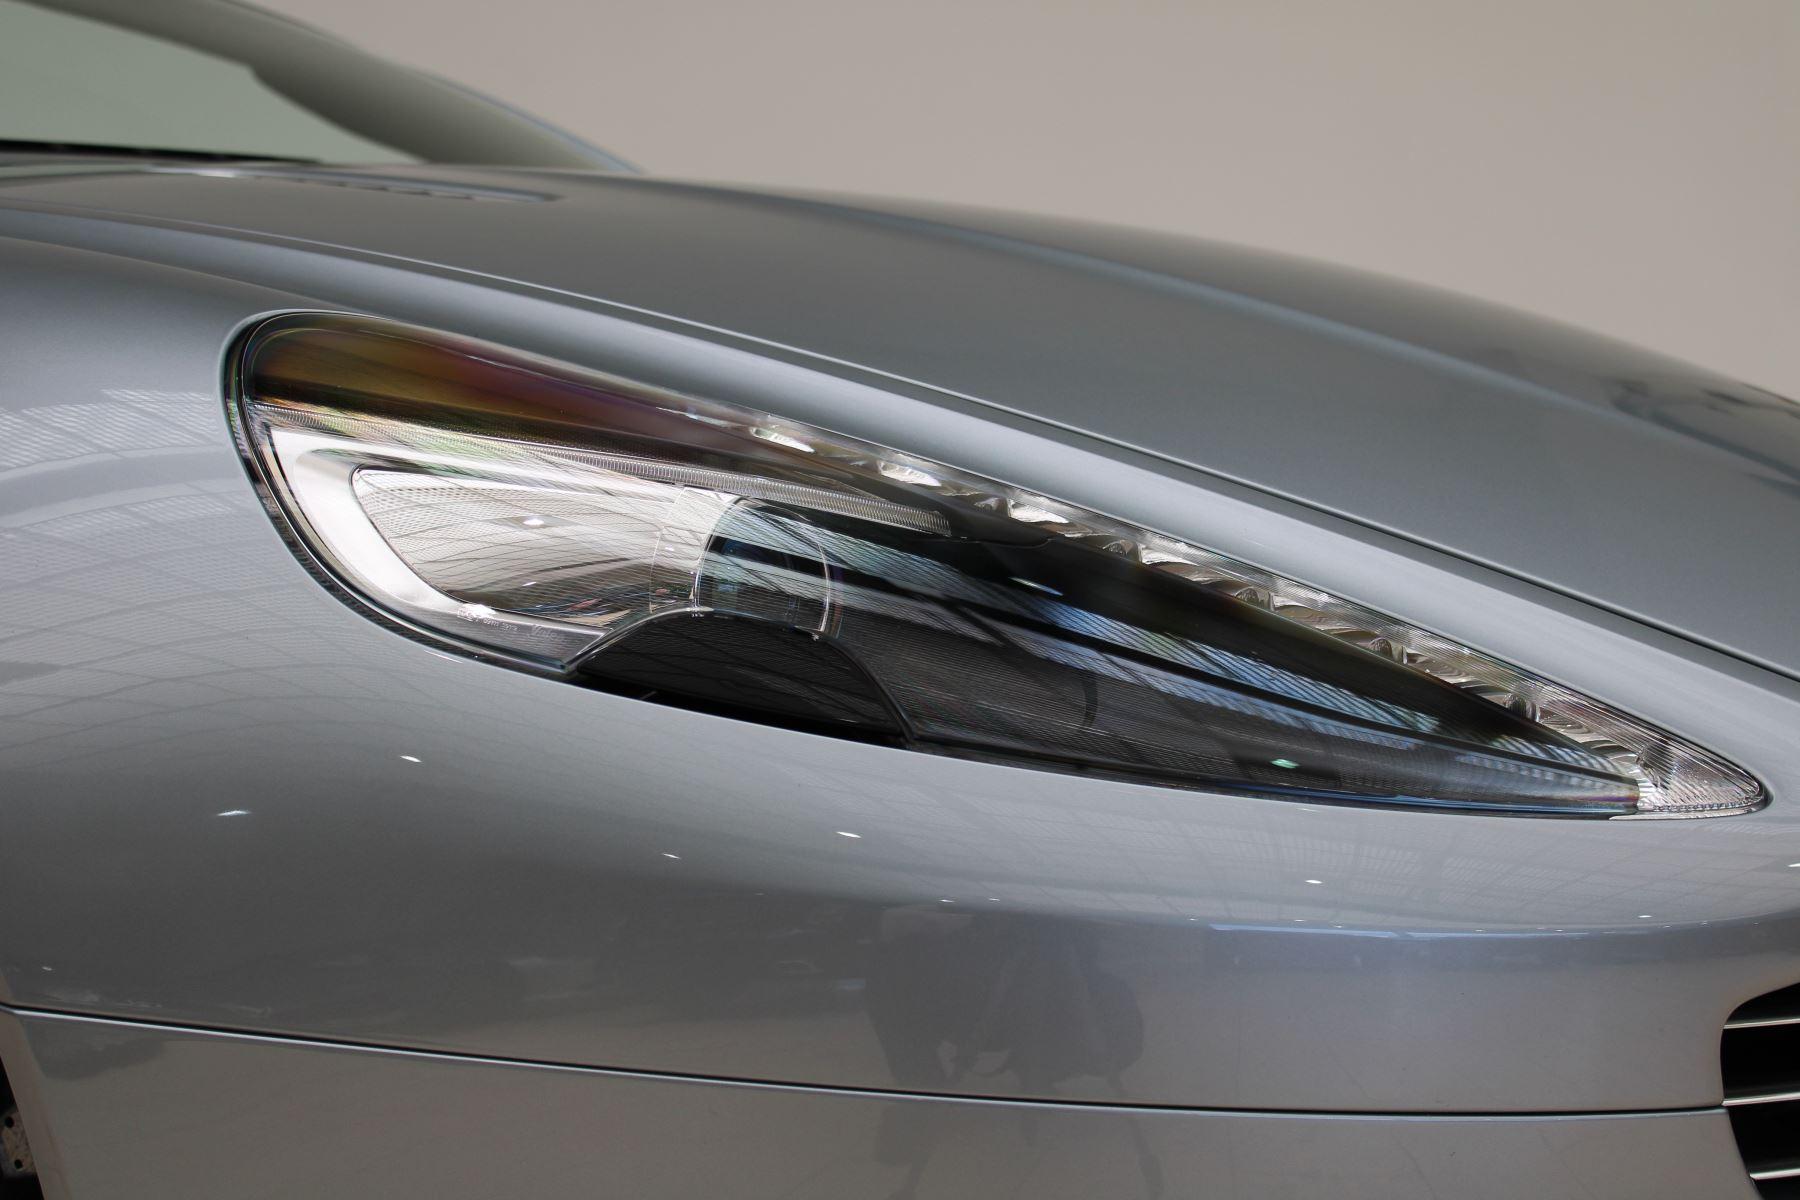 Aston Martin DB9 V12 GT 2dr Volante Skyfall Silver image 14